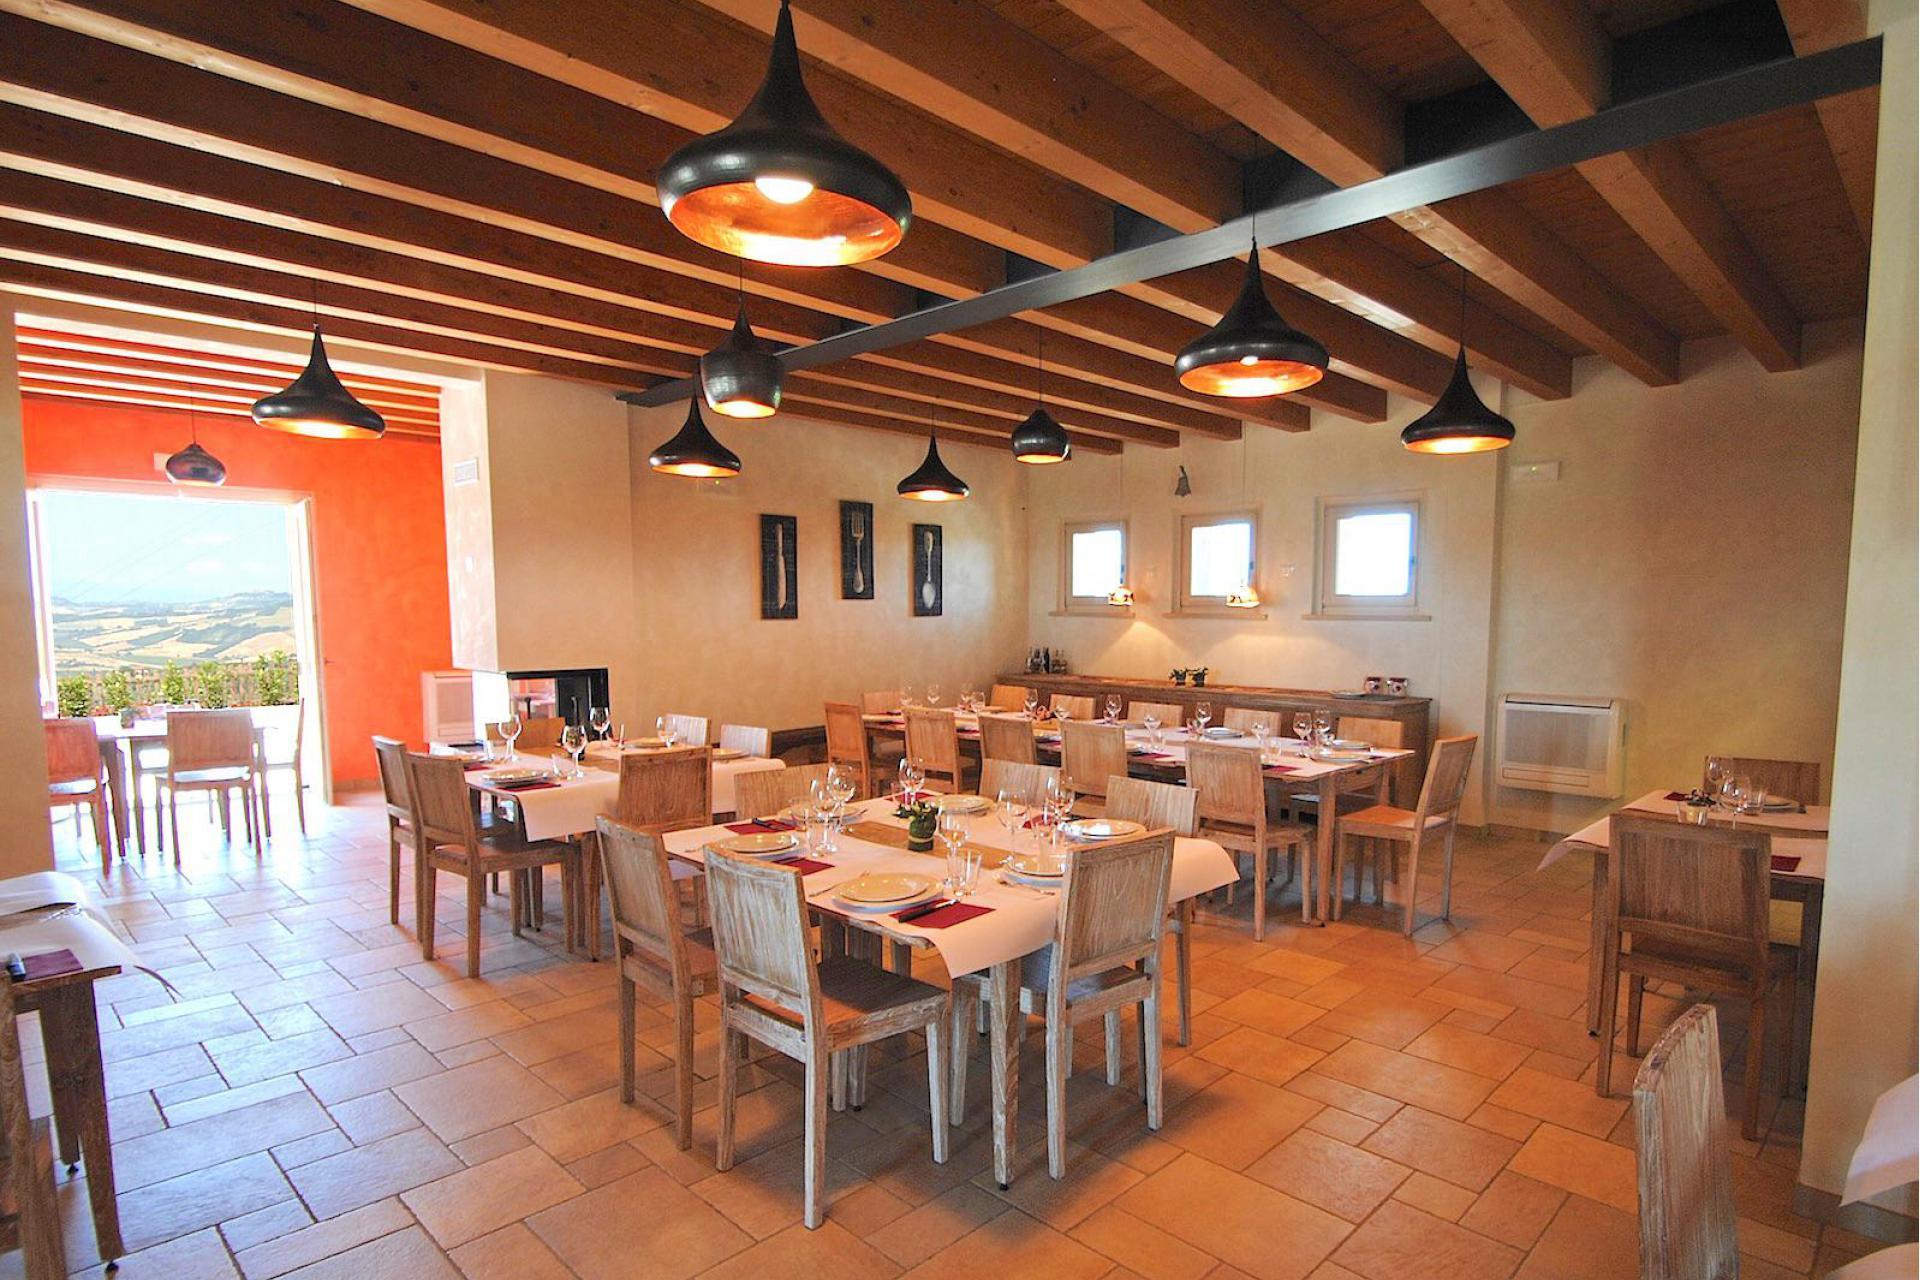 Agriturismo Toscana Accogliente agriturismo a 800 metri dalla costa toscana